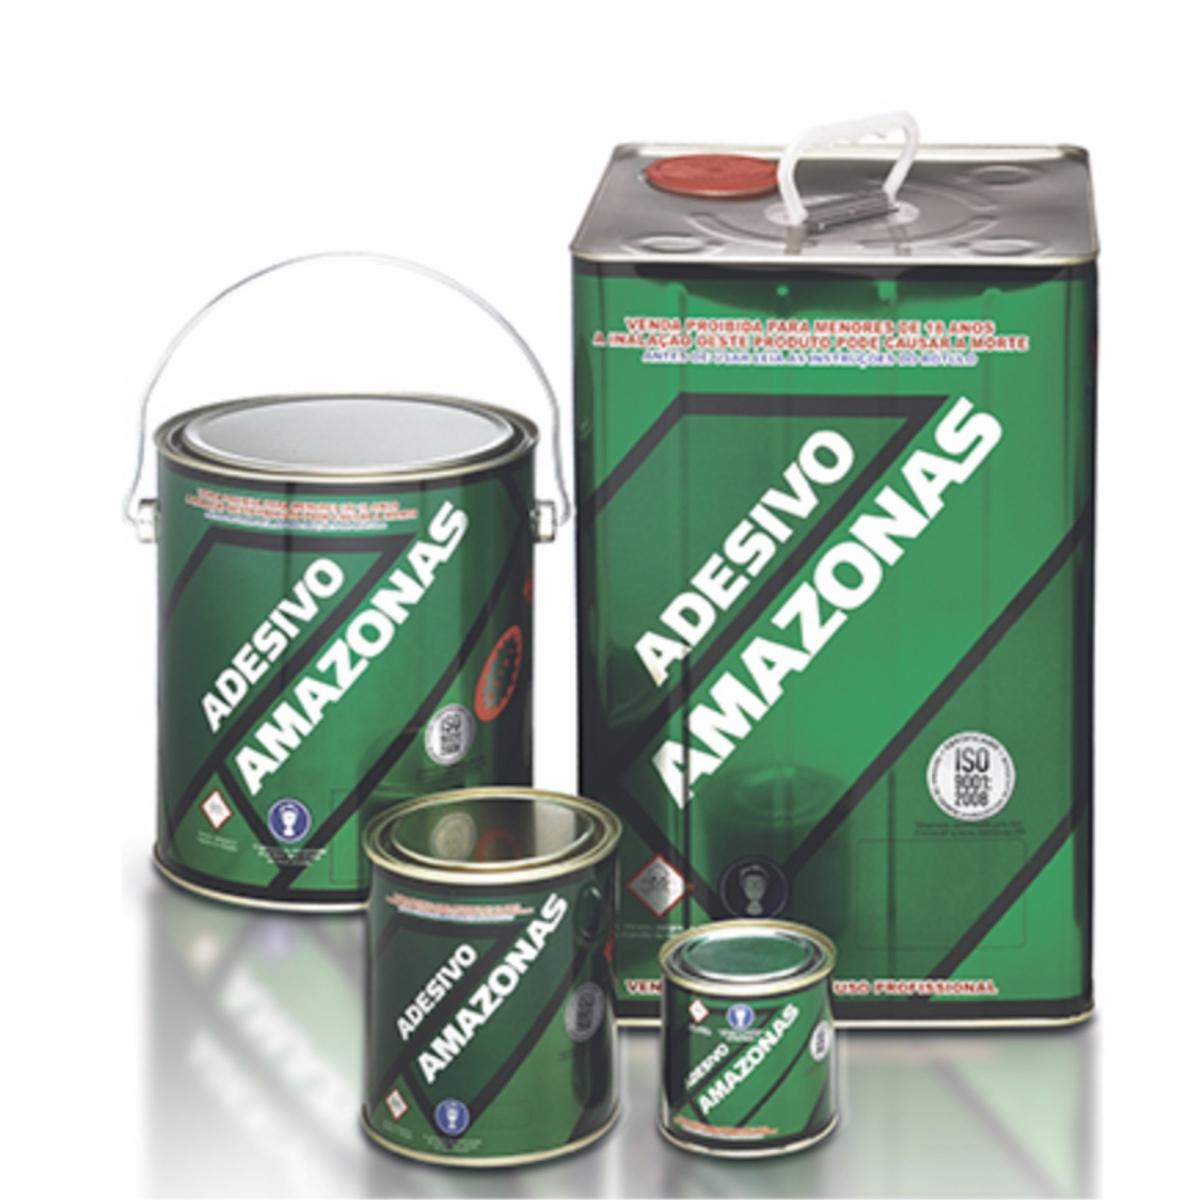 Cola De Contato Extra Universal De Sapateiro Amazonas Peso:750g